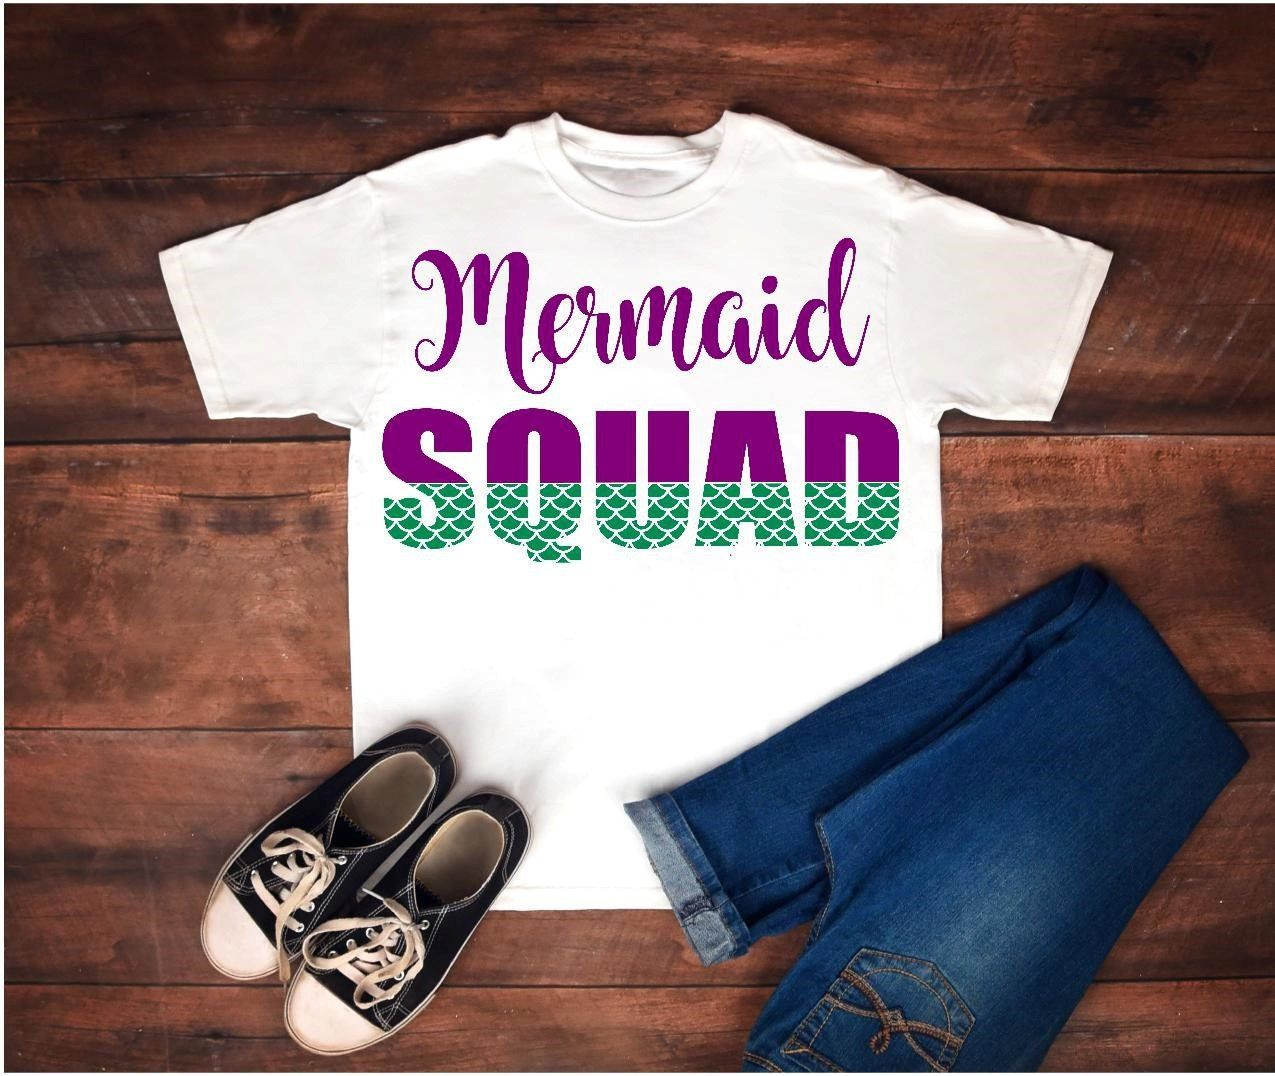 Mermaid Squad Shirt, Mermaid Squad, Mermaid Shirt, Family